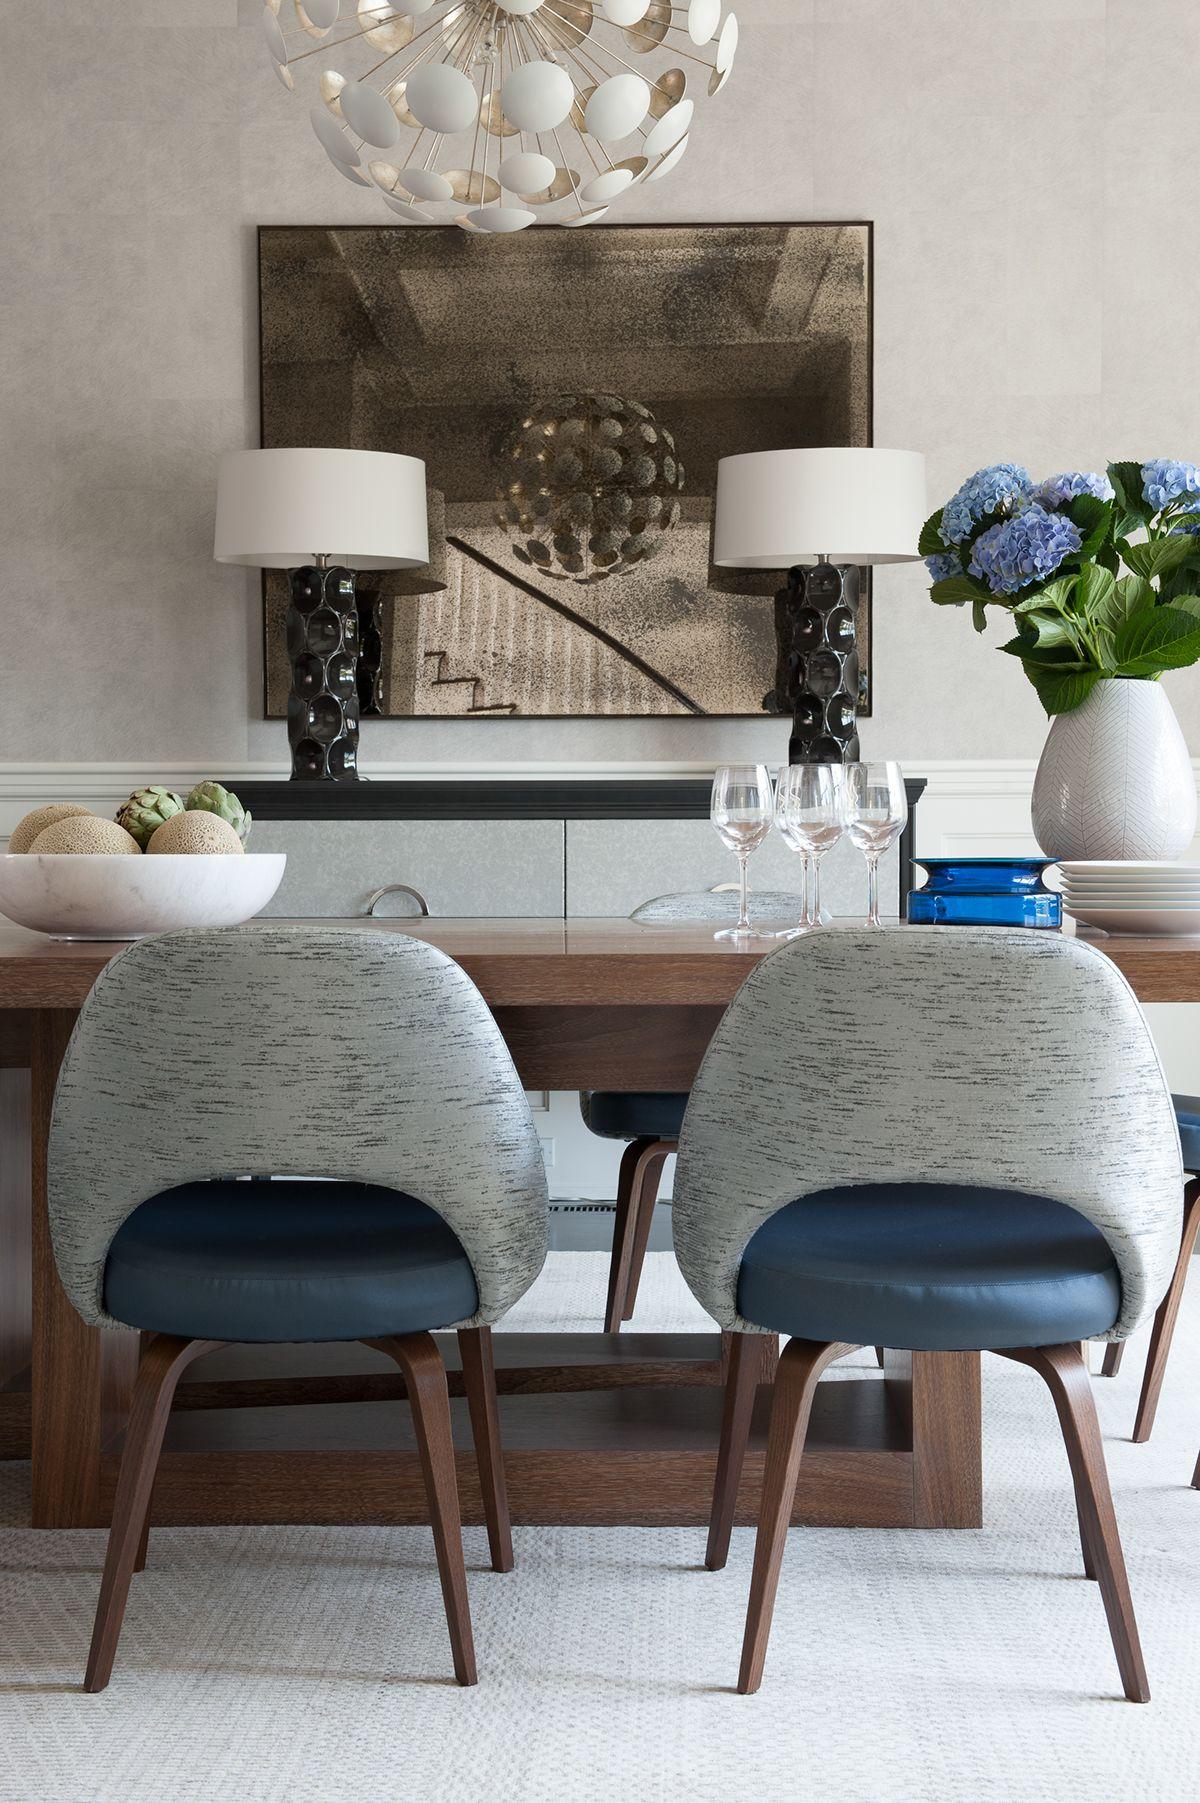 Kitchen Dining Interior Design: Interior Design Renovation In Bridgehampton, NY. In 2019